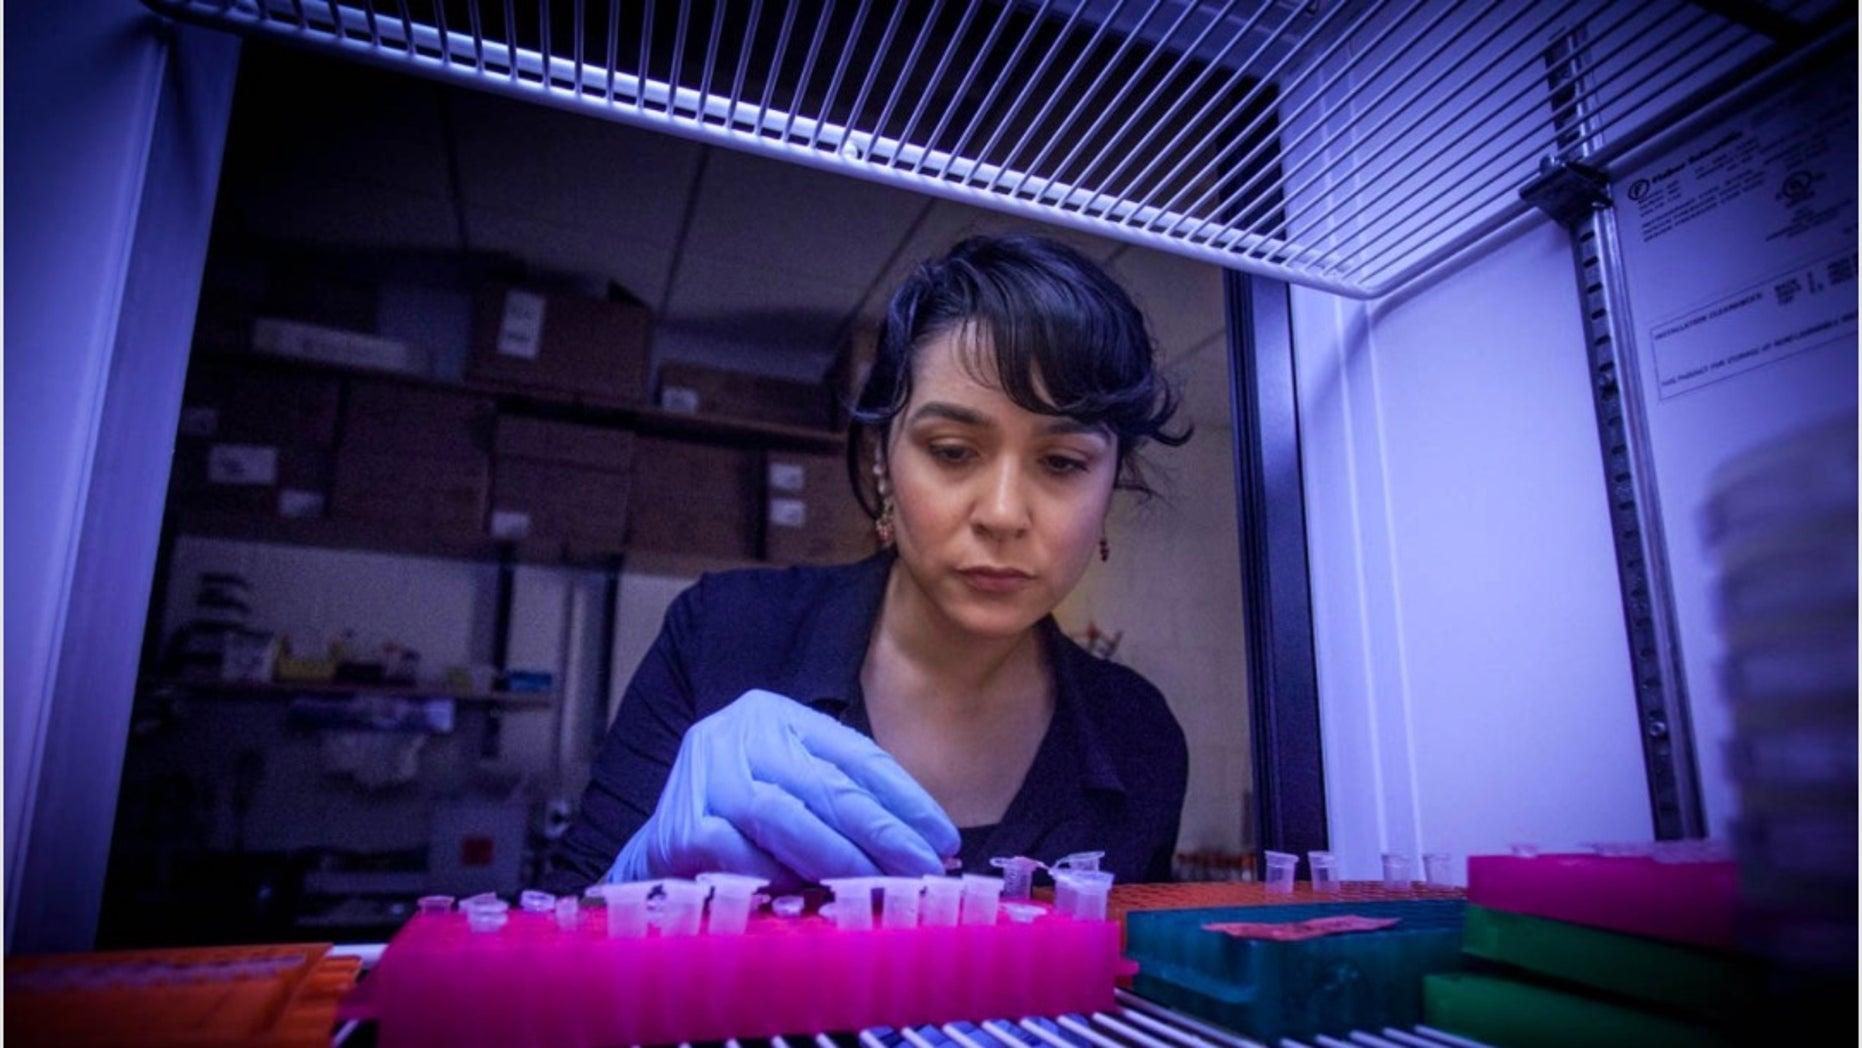 Betül Kacar in her lab.